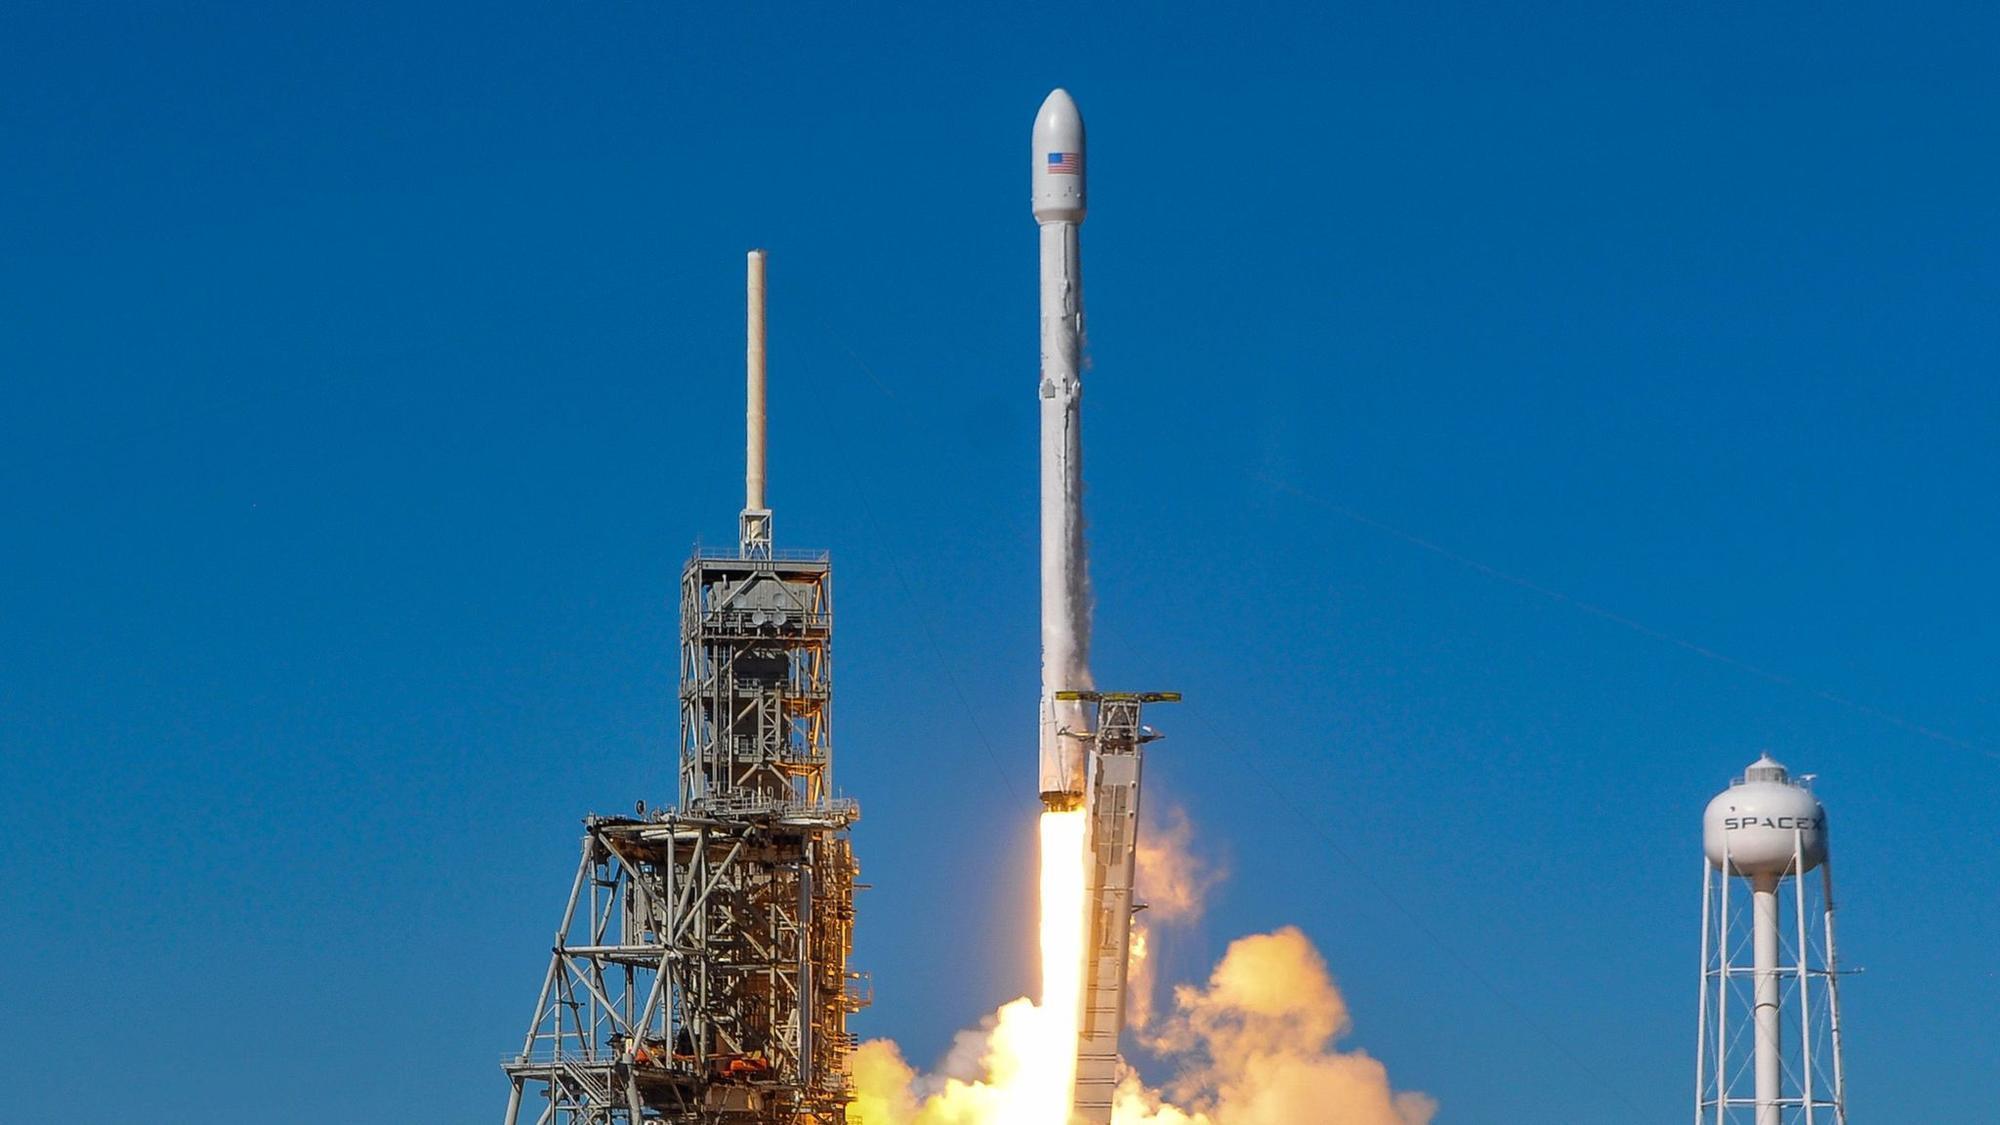 spacex says rocket engine test failure won t affect its launch schedule la times